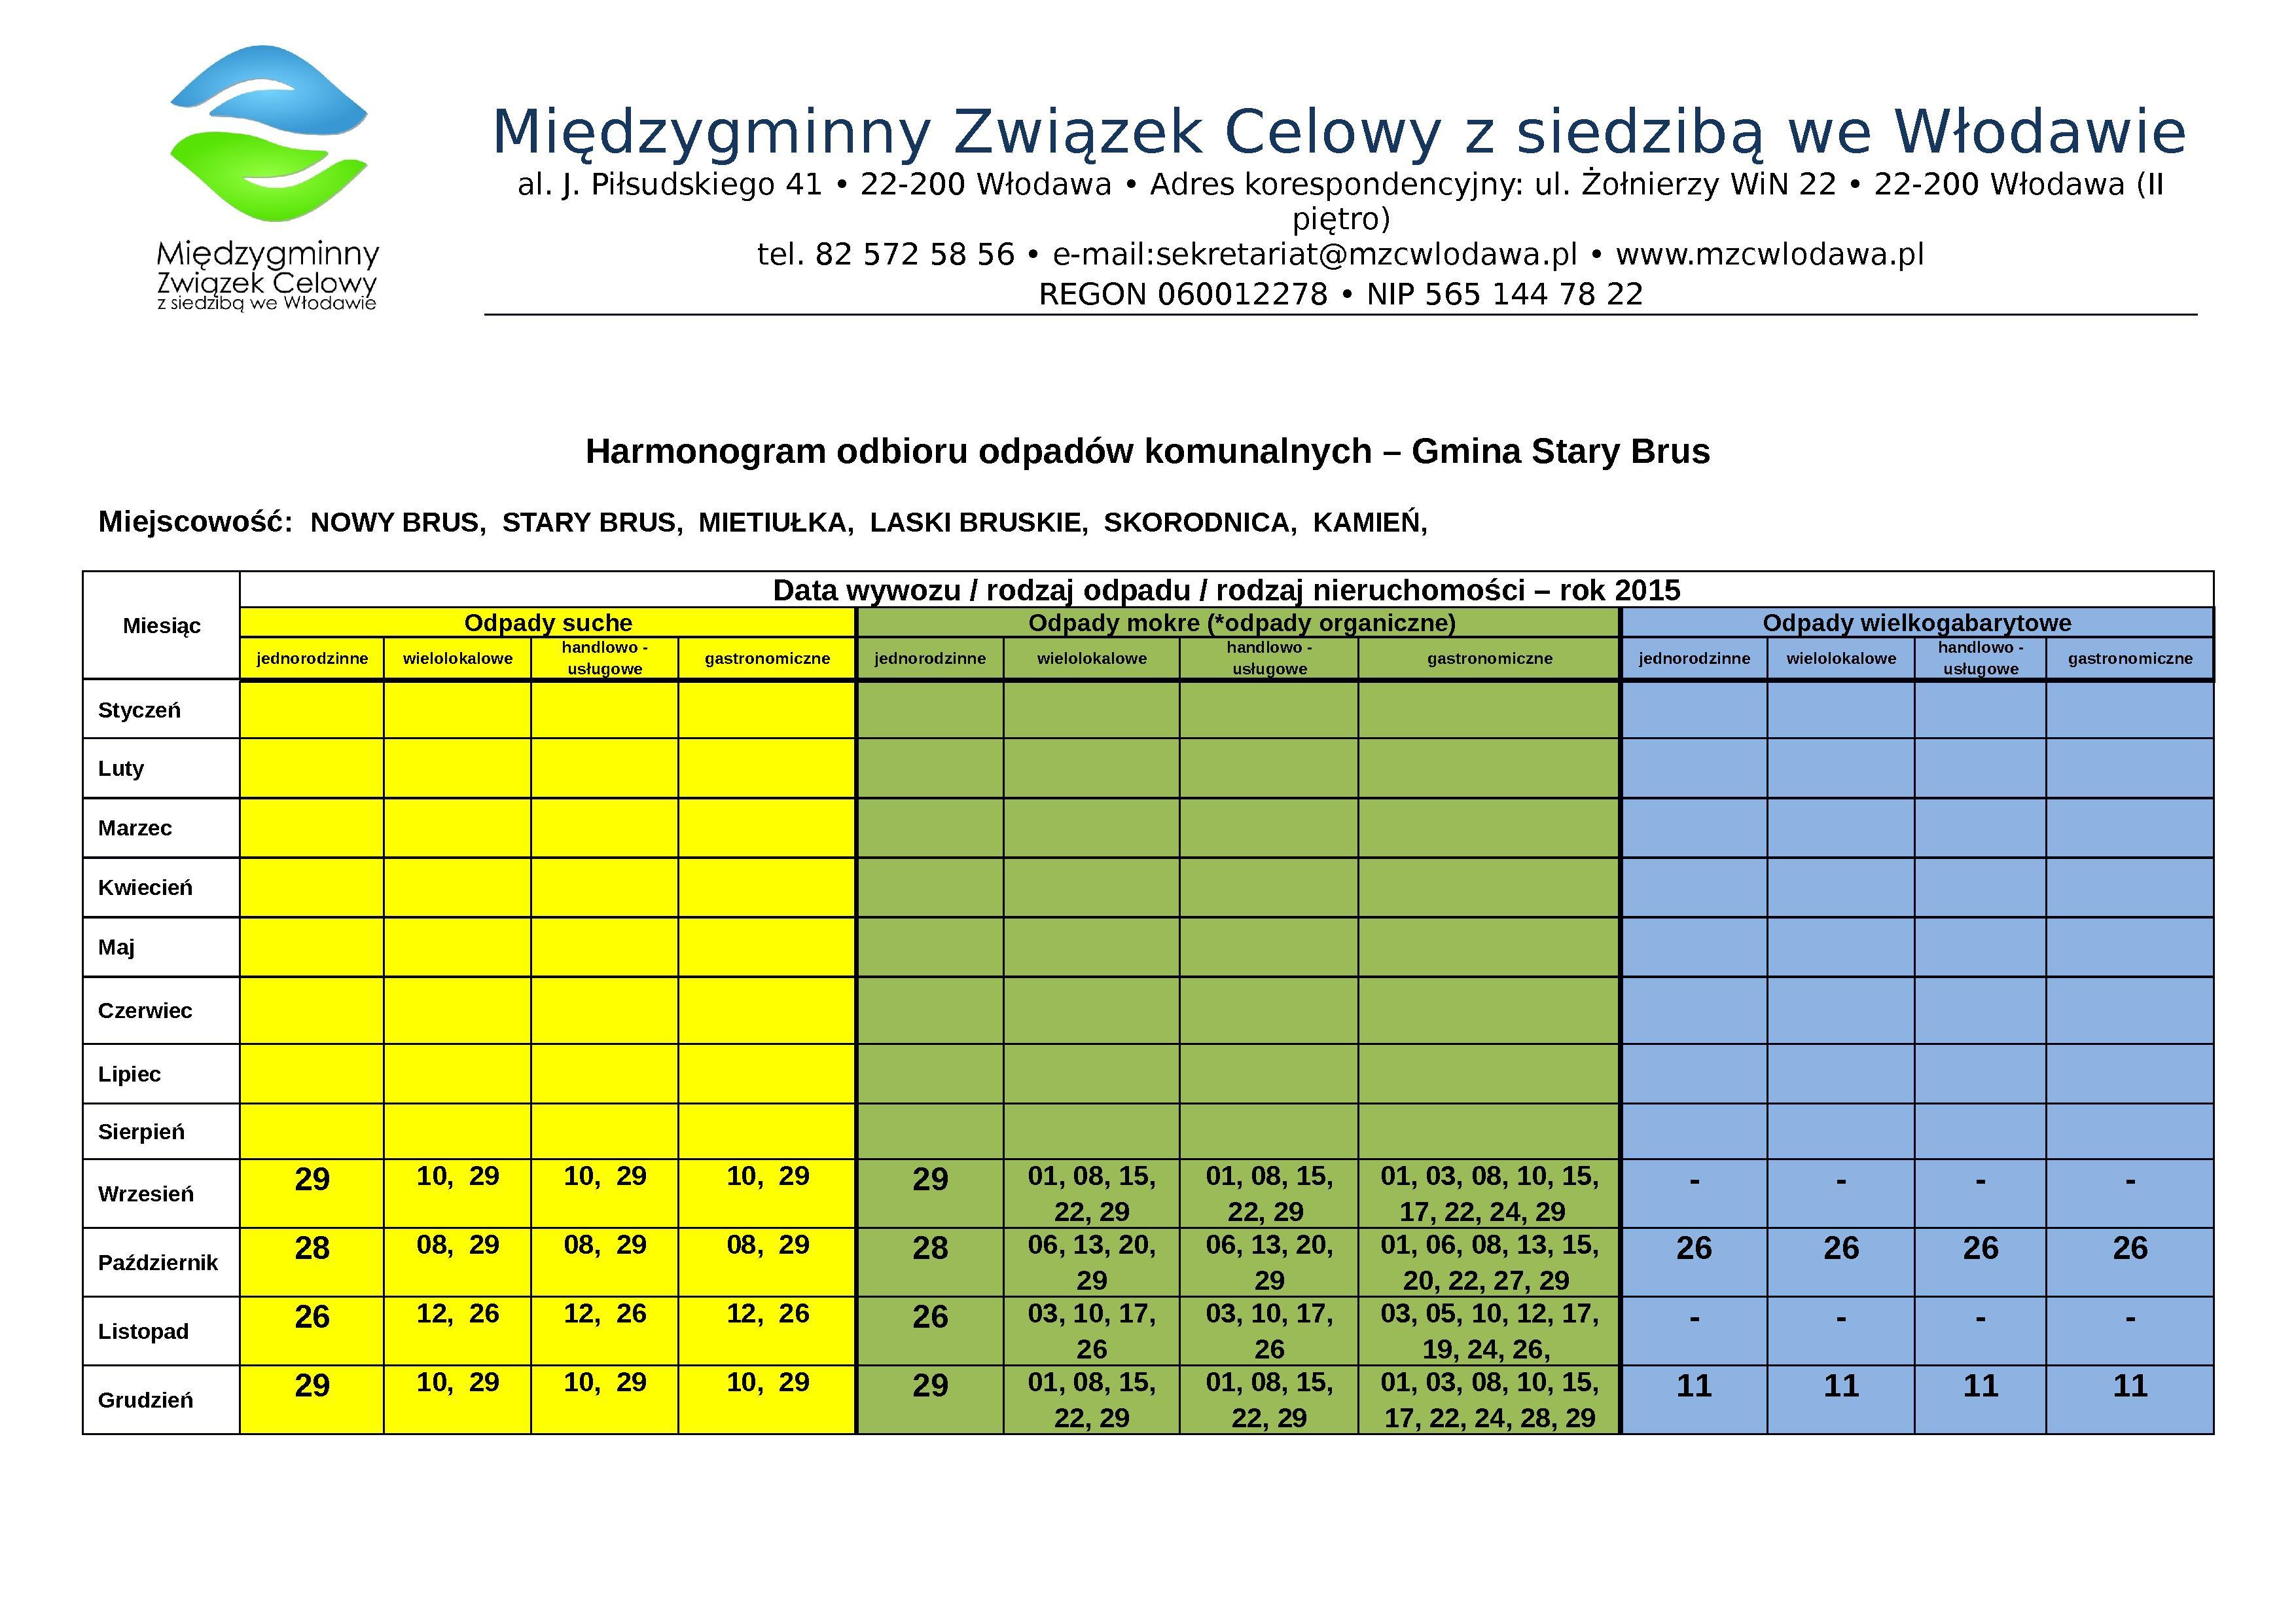 Harmonogram odb odp kom Stary Brus 2.pdf.02